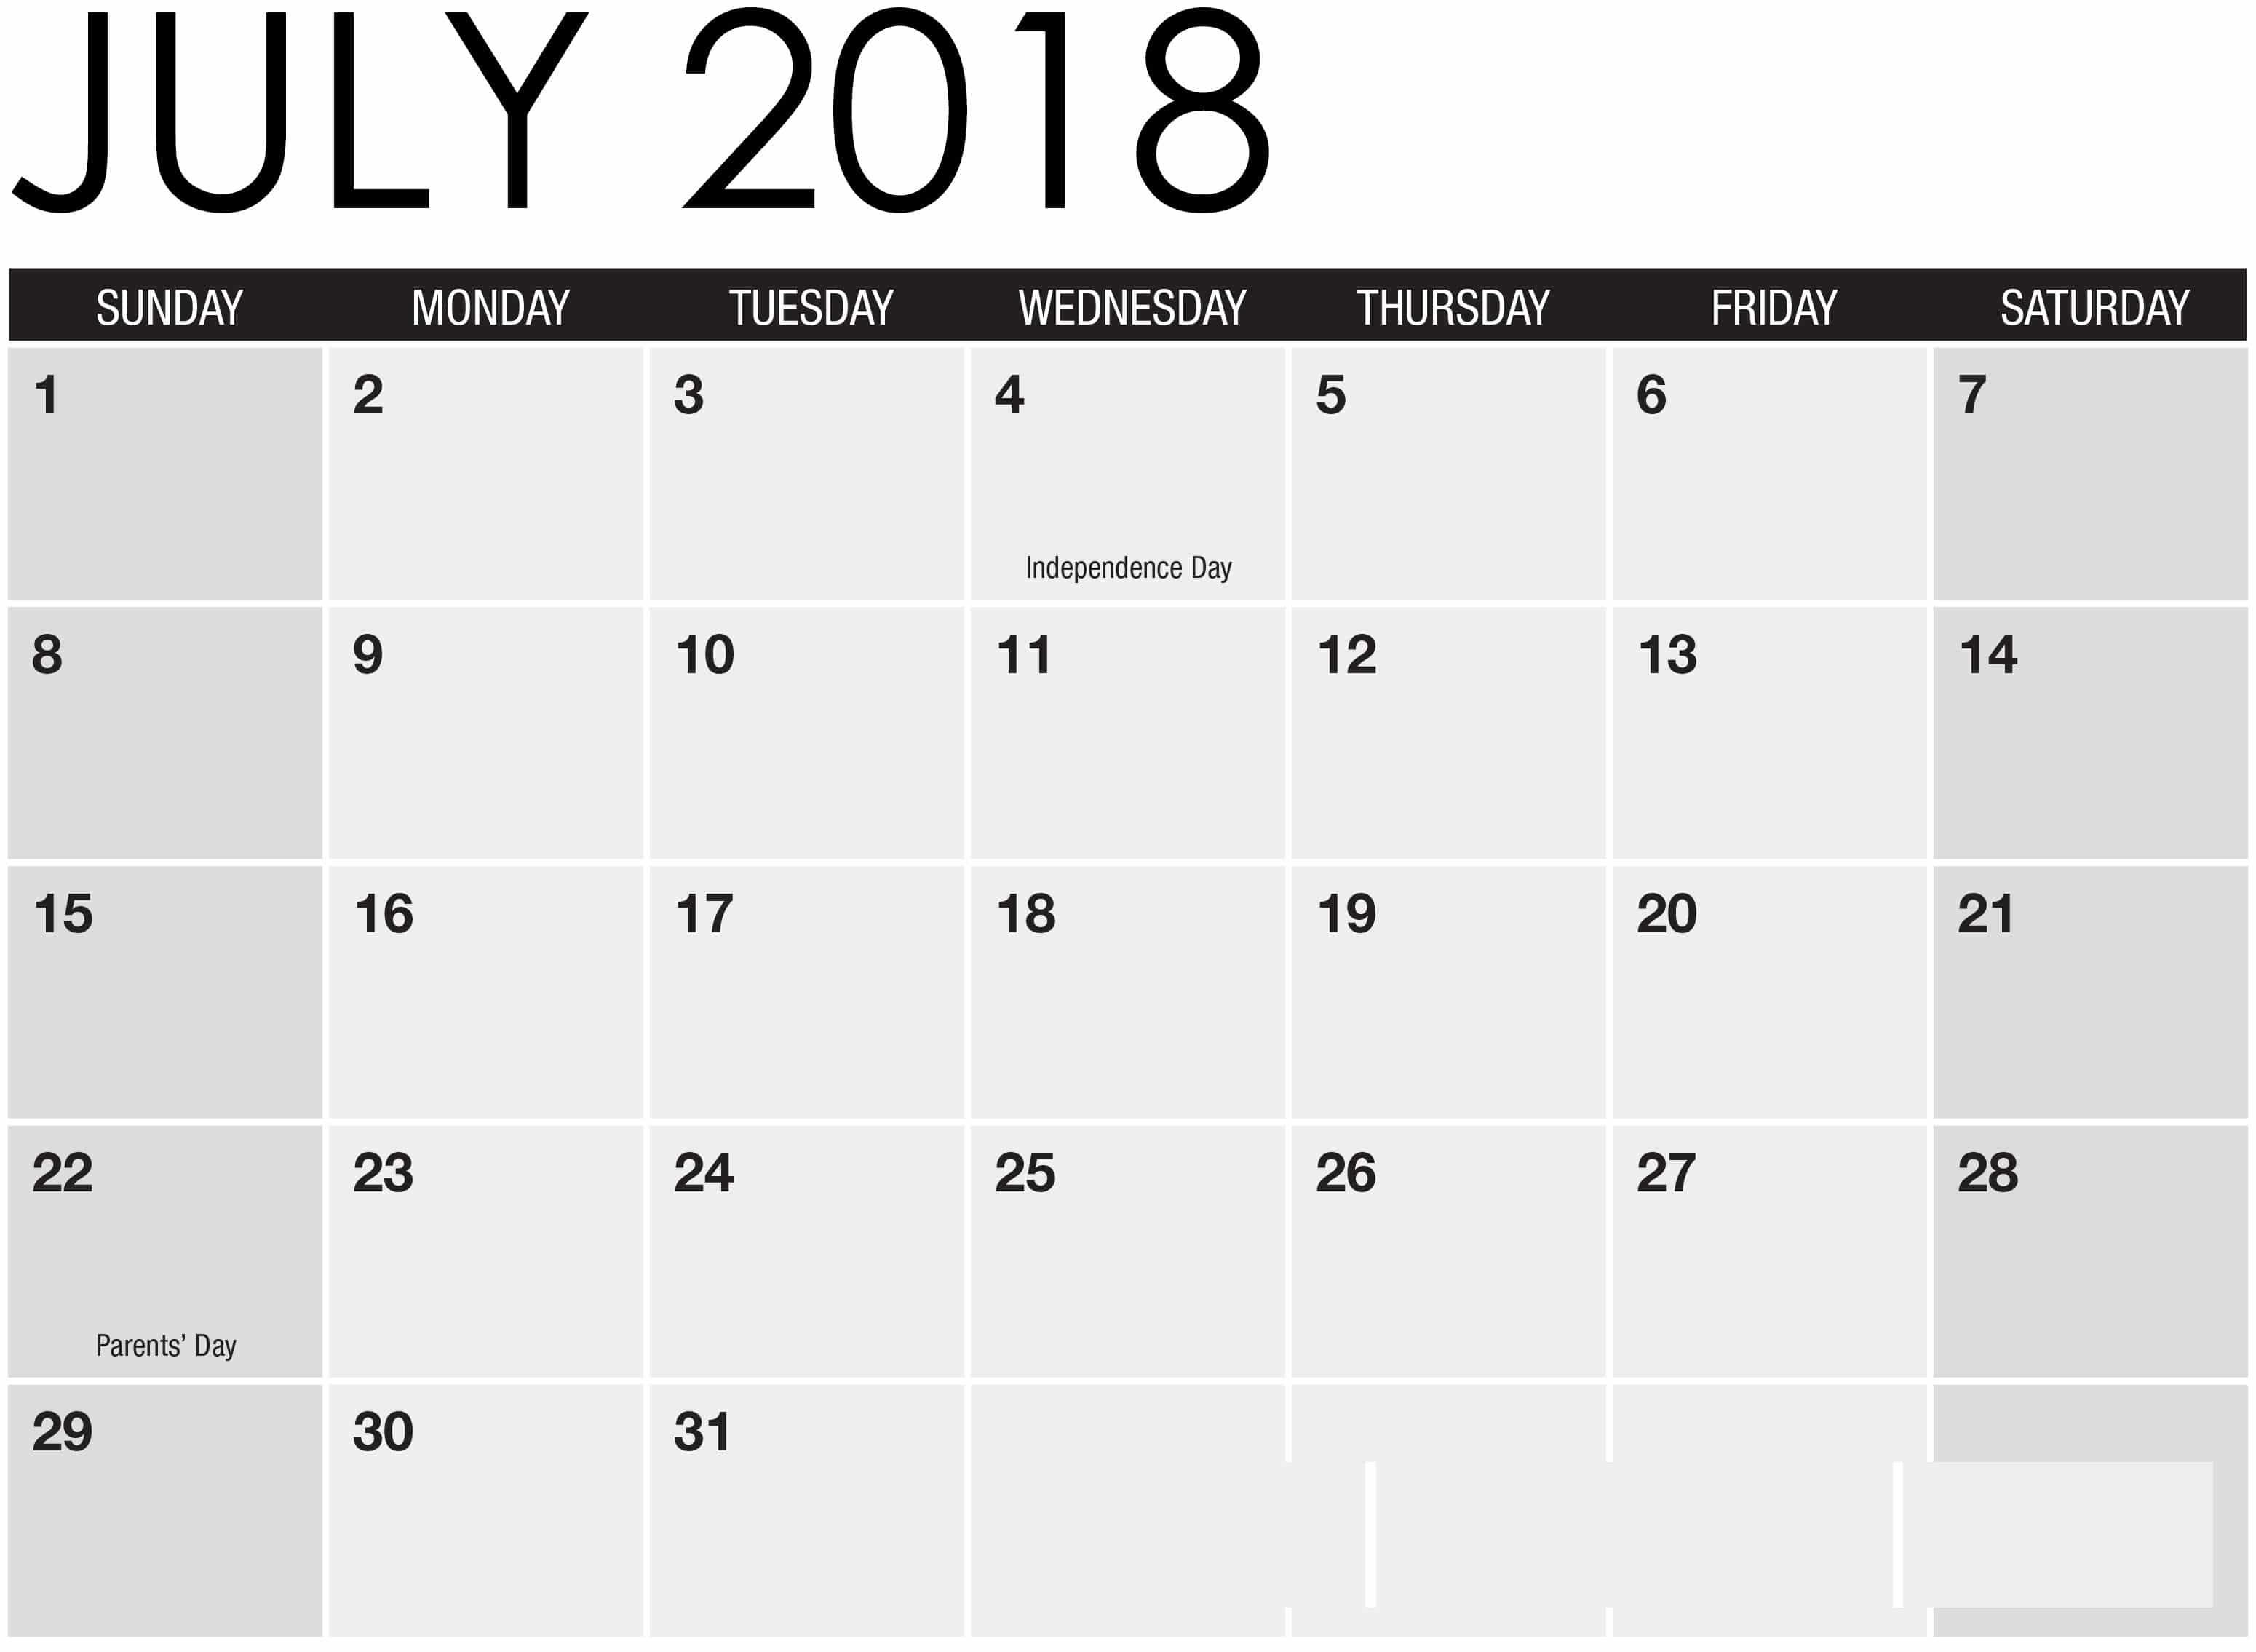 photograph regarding Calendar July Printable named Printable Calendar July 2018 Term Excel Quotation Shots High definition Totally free